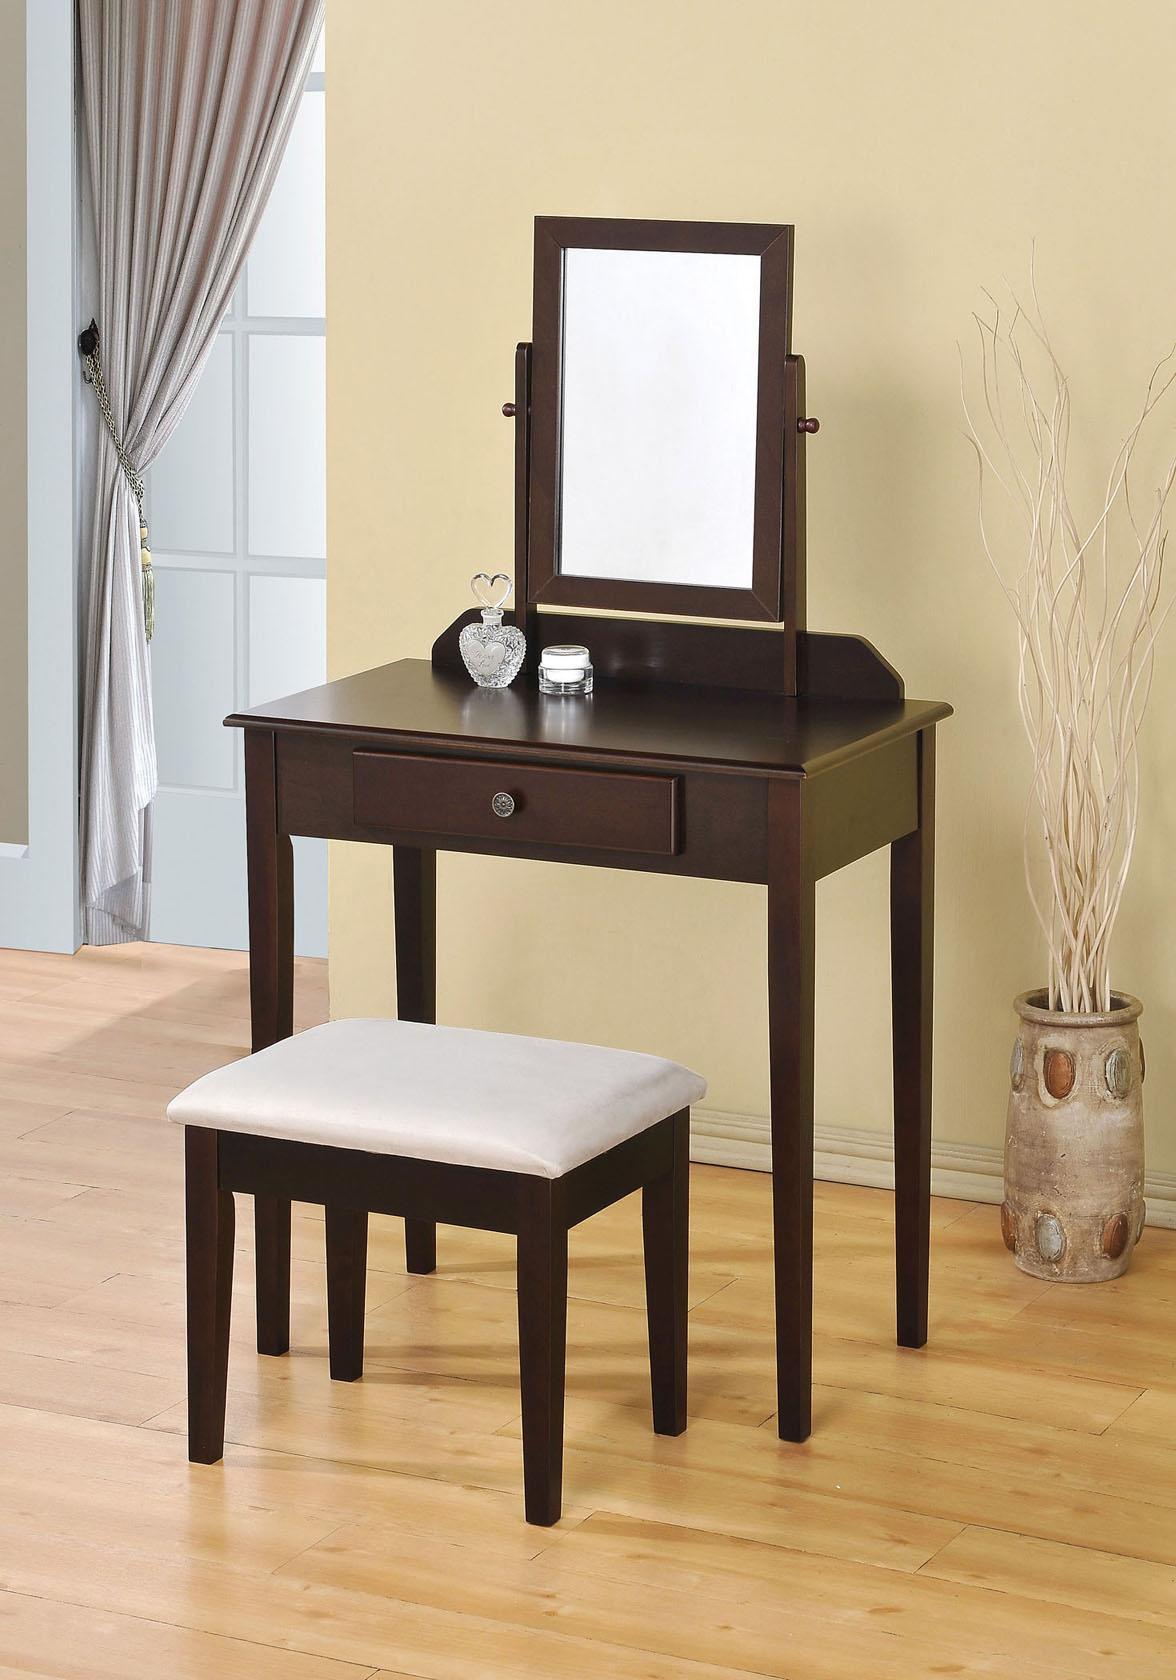 Acme Furniture Jamy 2-Piece Vanity Set - Item Number: 90040